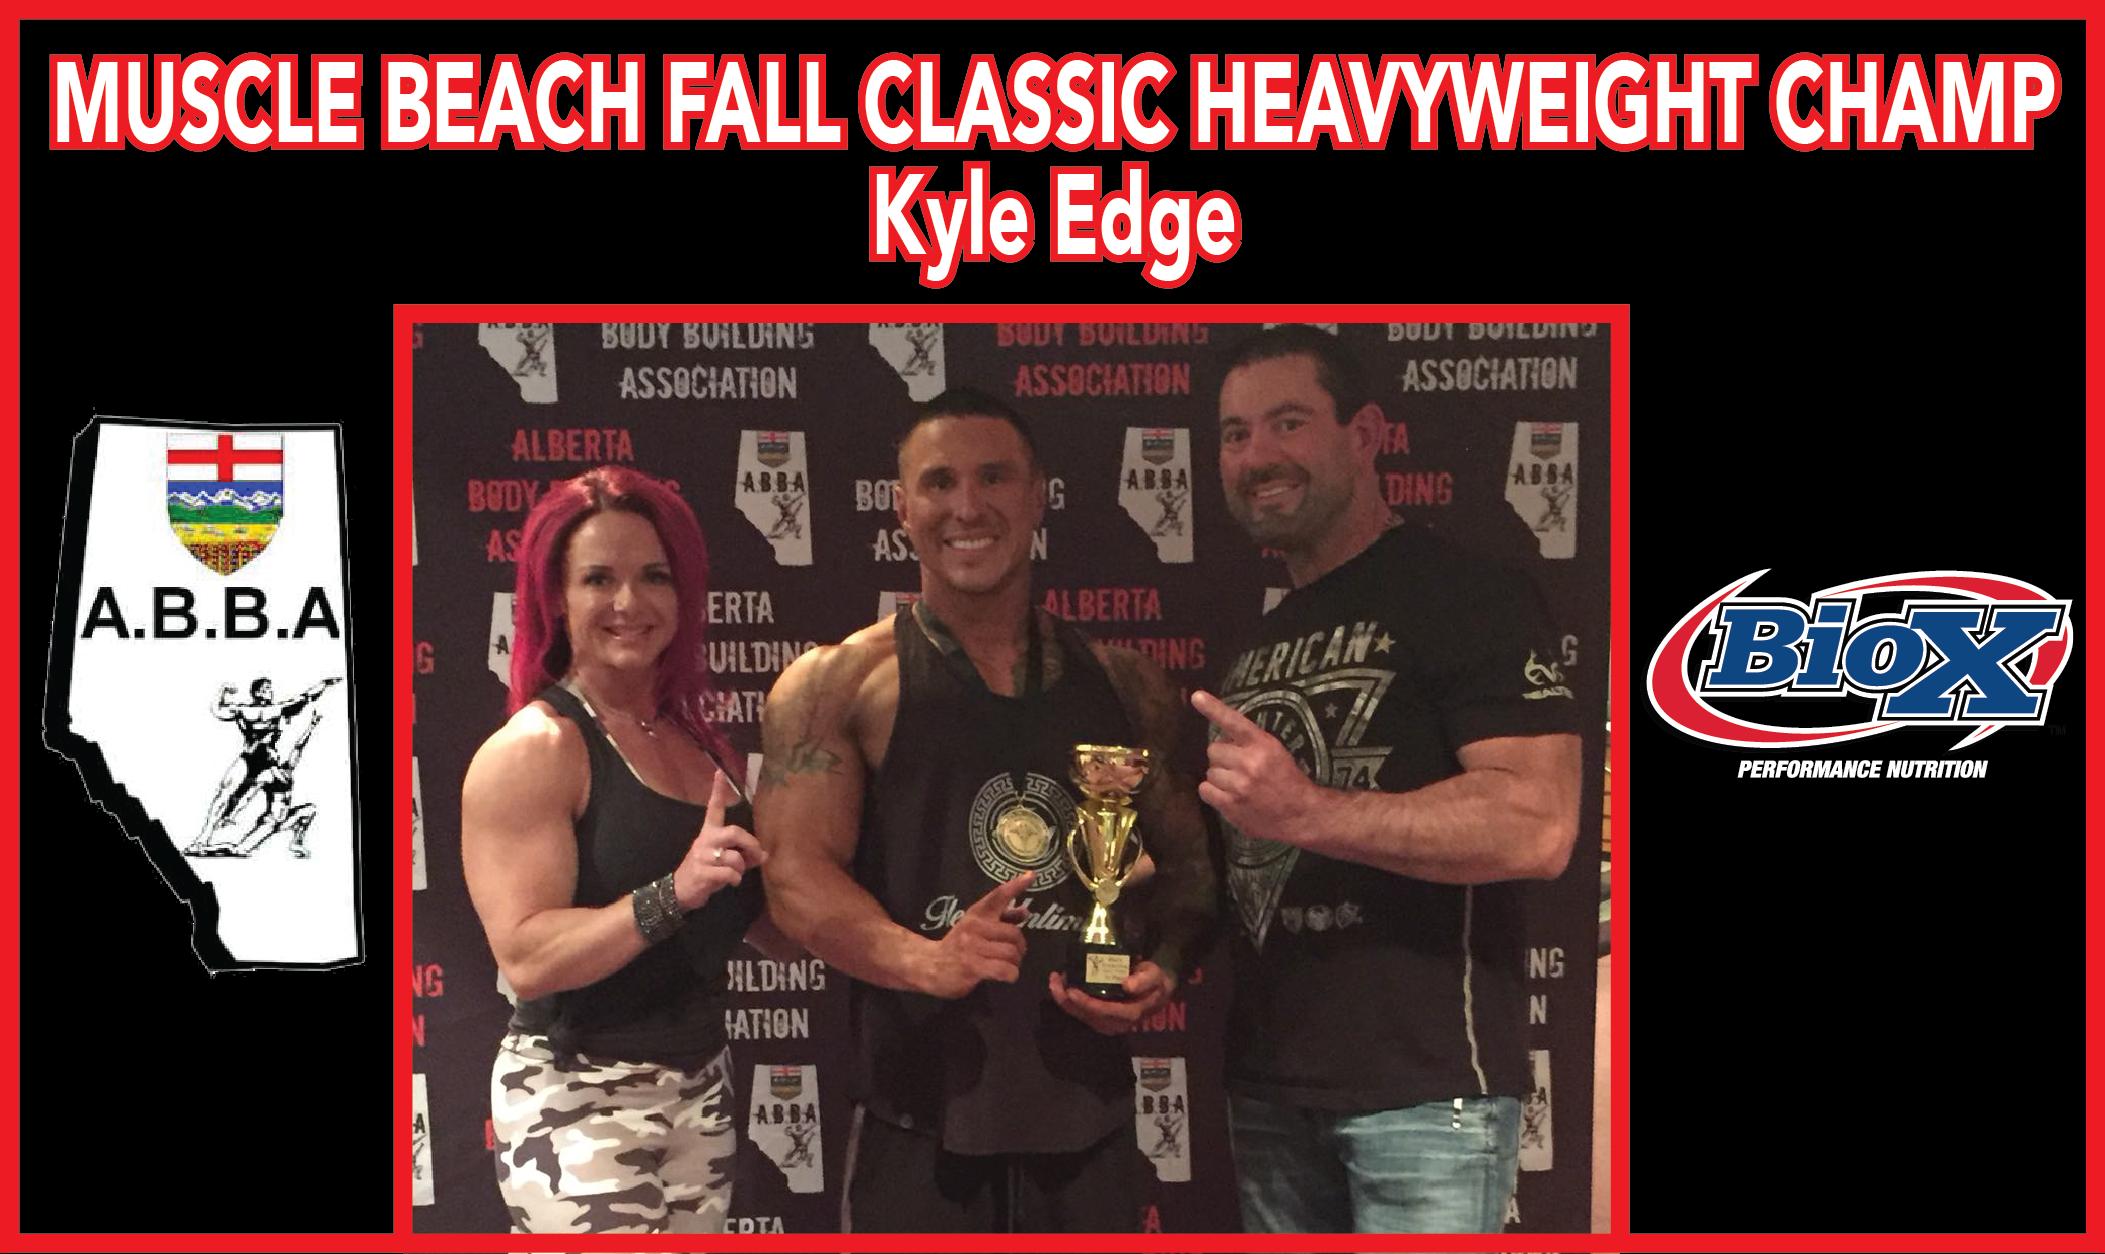 Muscle Beach Heavyweight Champ